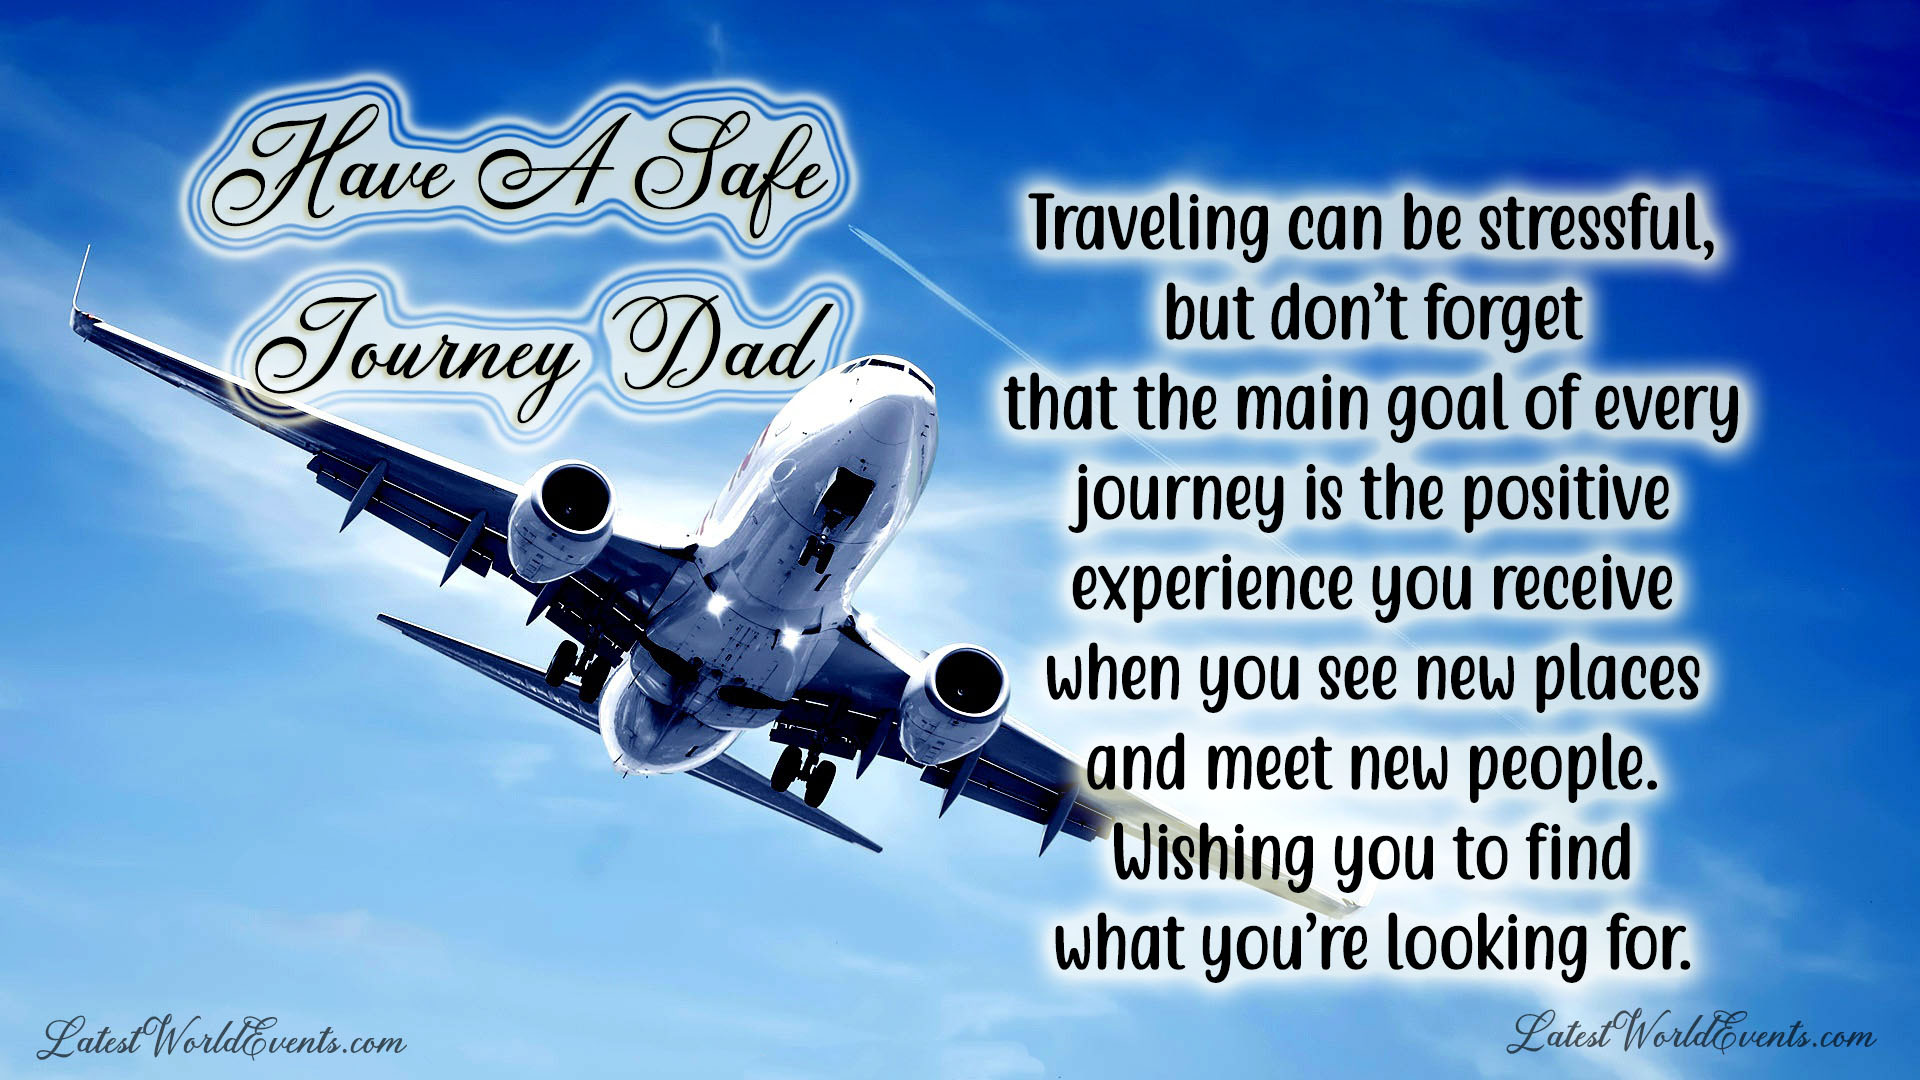 Wish you a safe flight